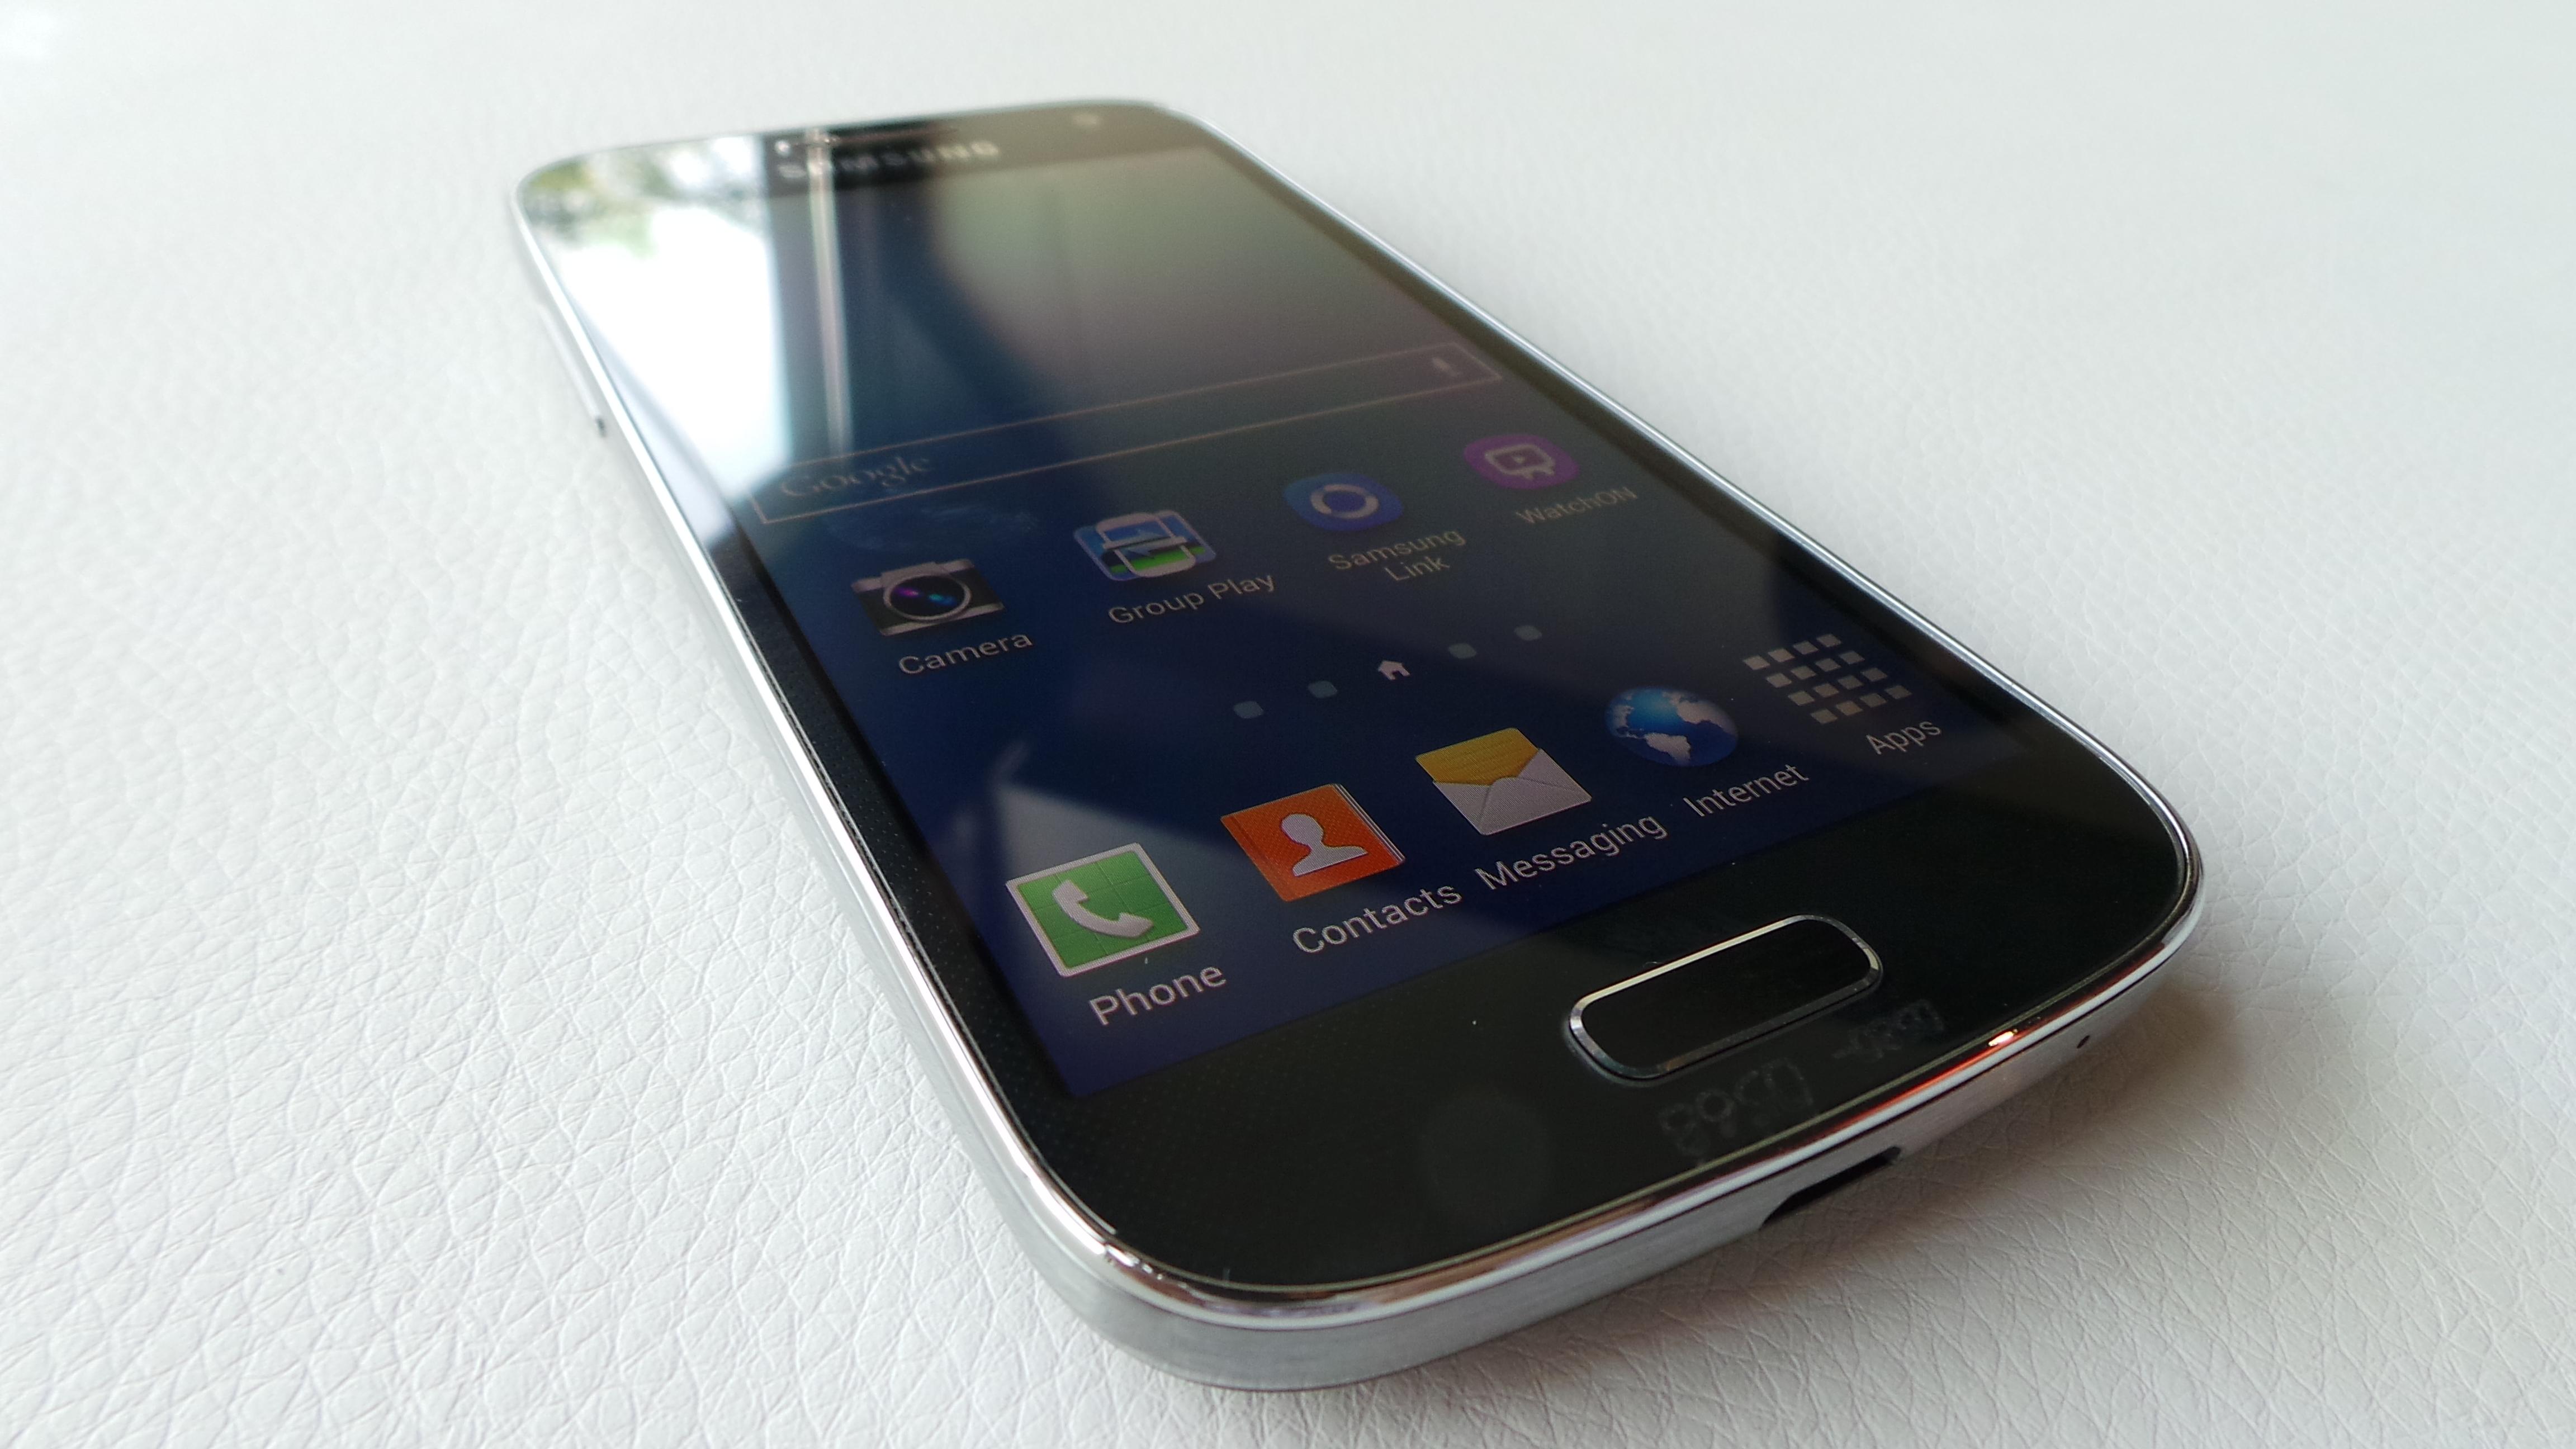 Samsung Galaxy S4 Vs Samsung Galaxy S4 Mini Hands-on Video